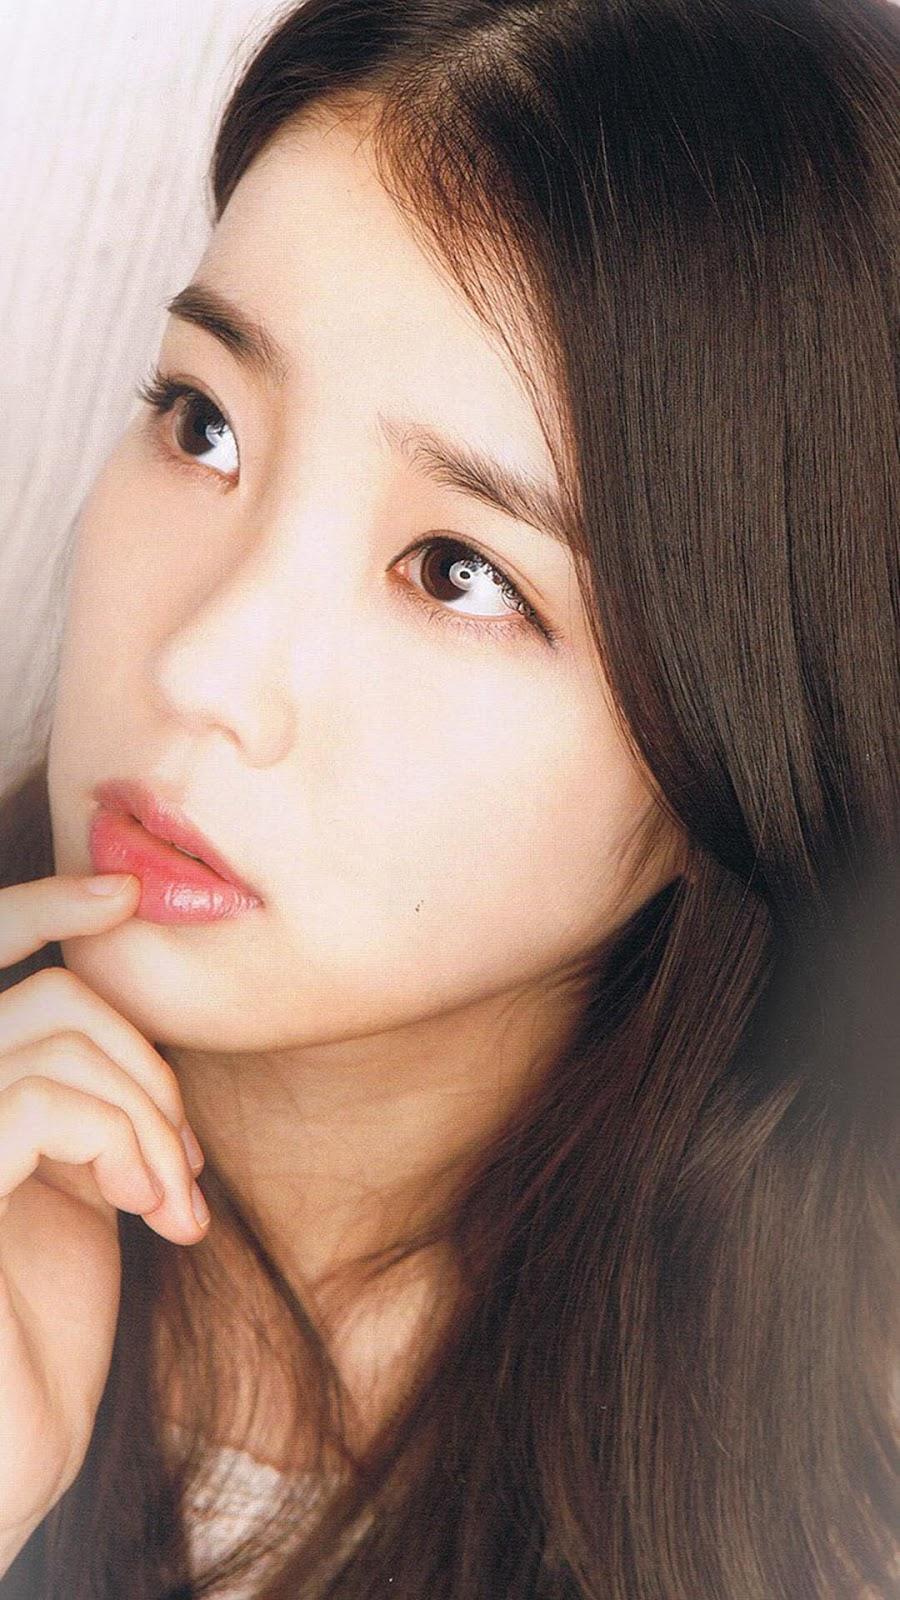 Iphone 7 Wallpaper Kpop Iu Girl Music Cute Hd Wallpapers 9to5wallpapers